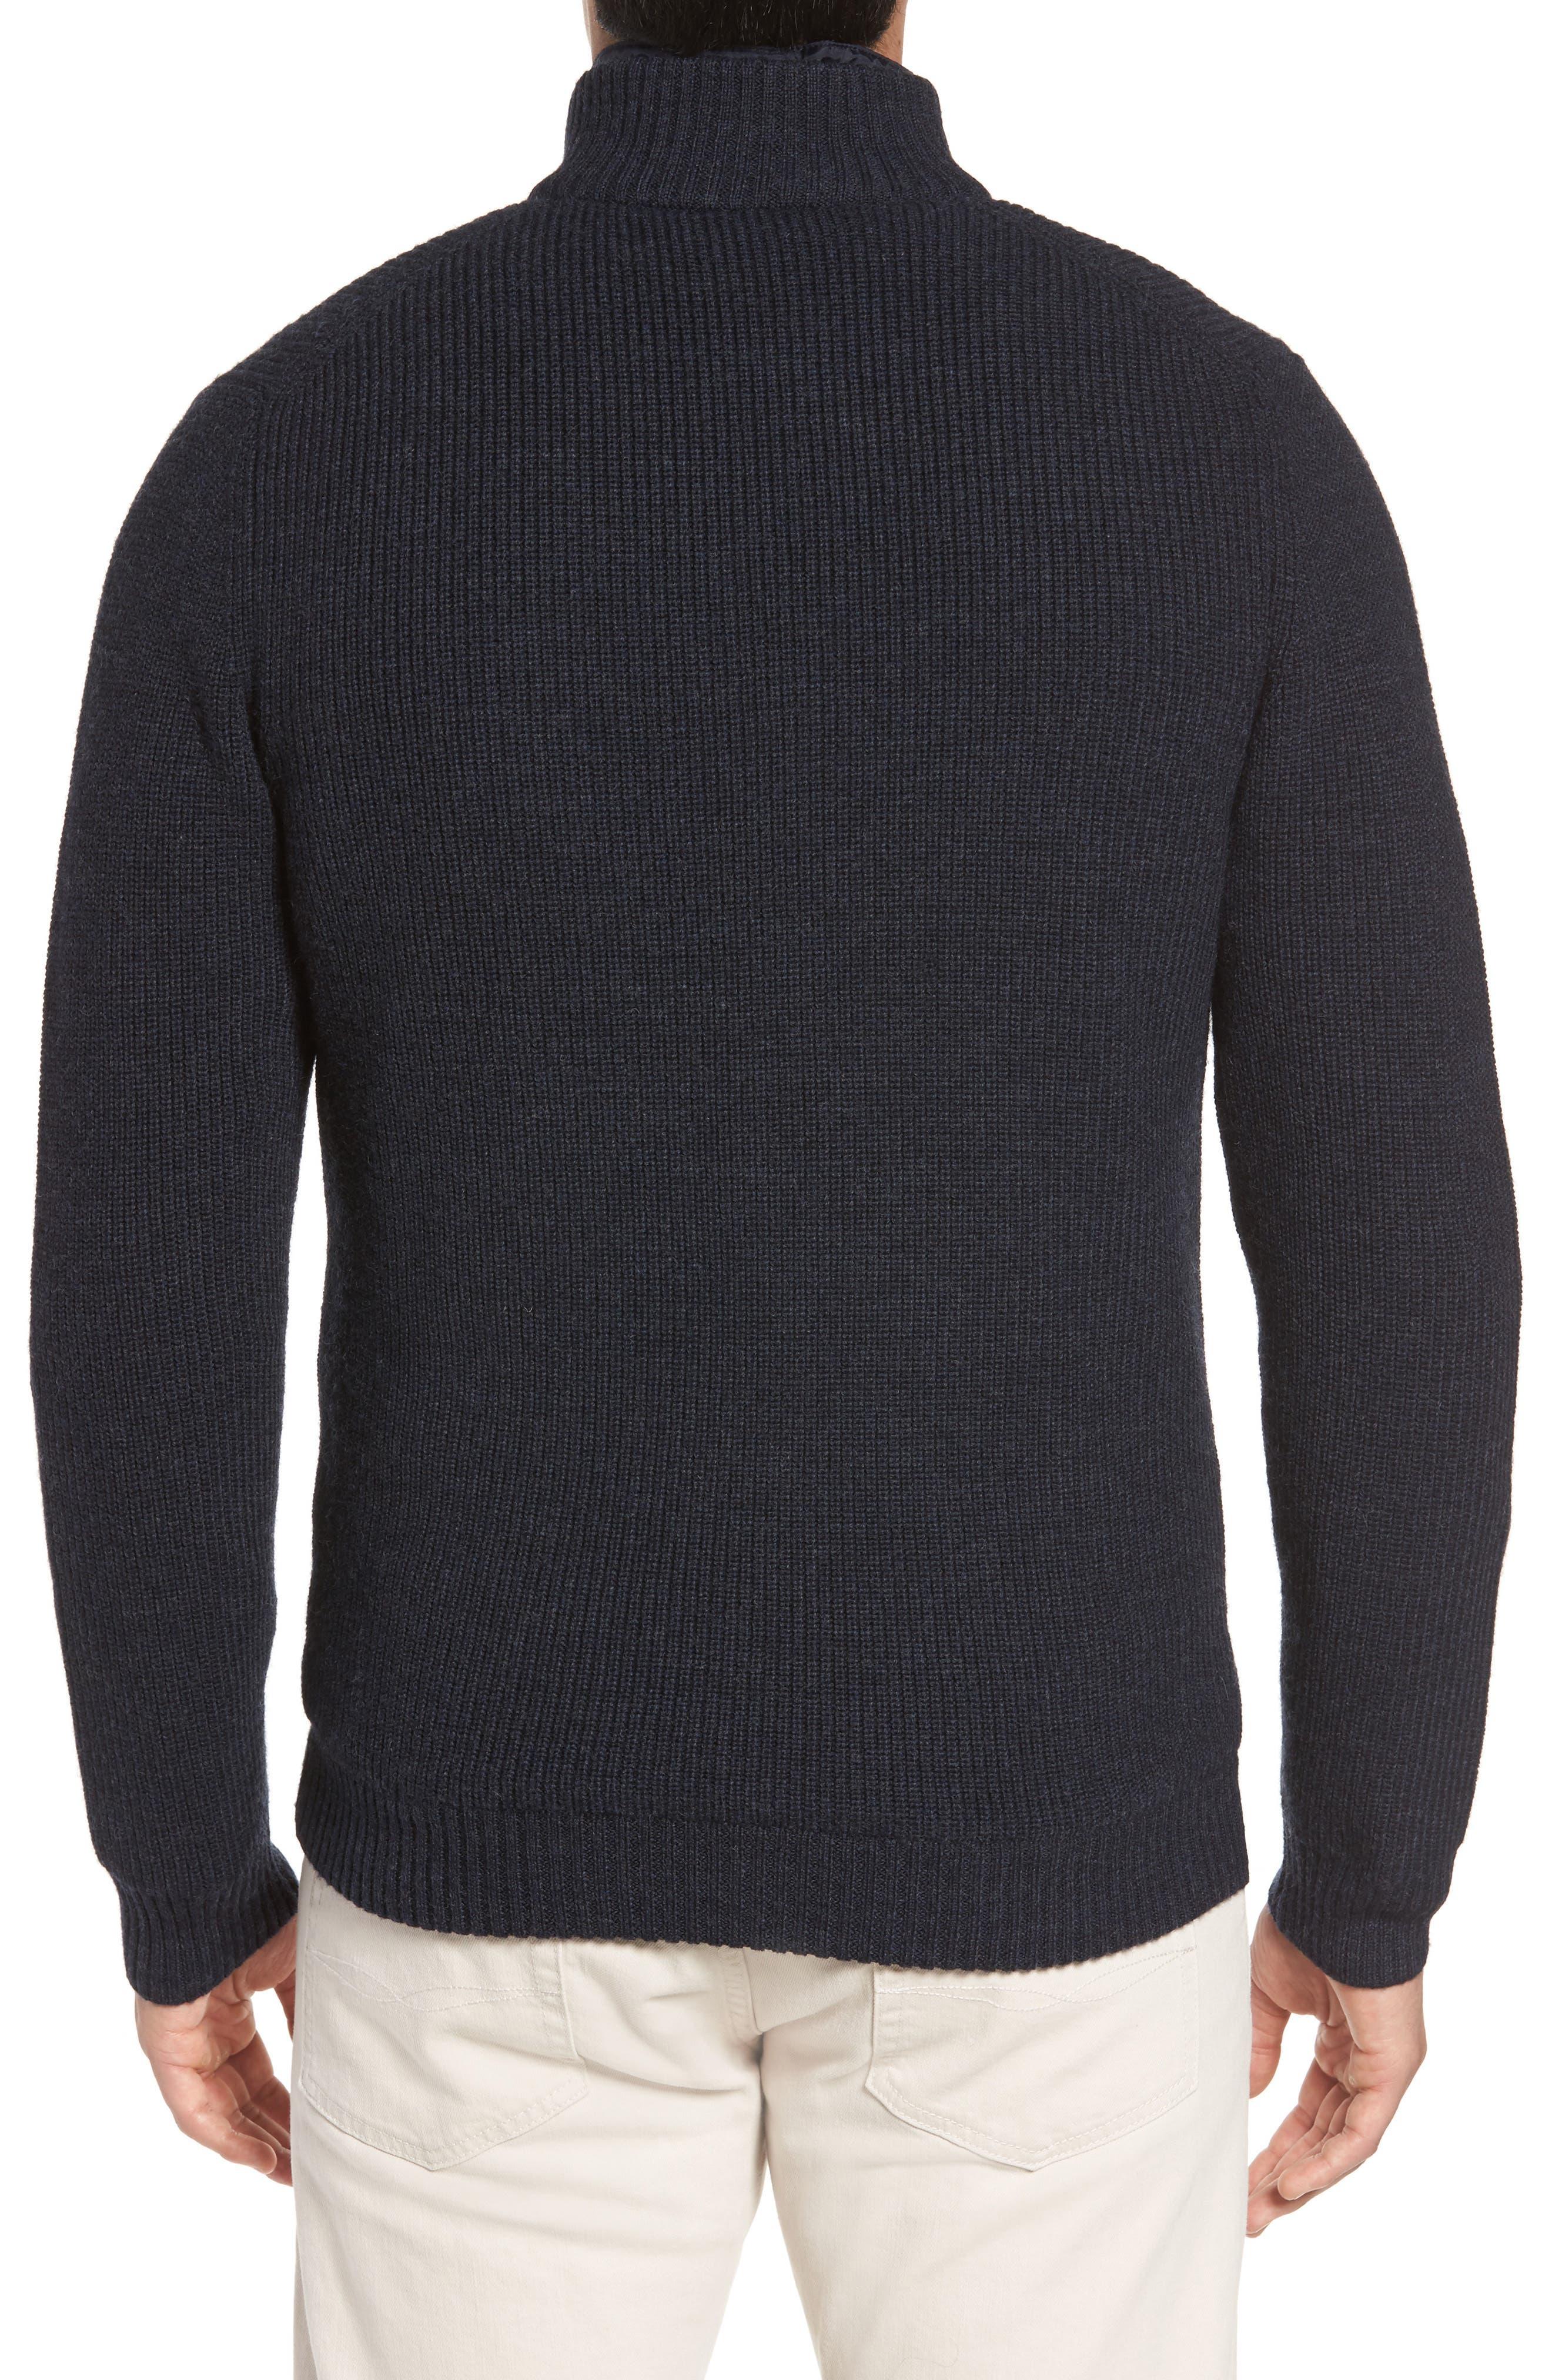 RODD & GUNN, Camerons Track Zip Wool Sweater, Alternate thumbnail 2, color, 412